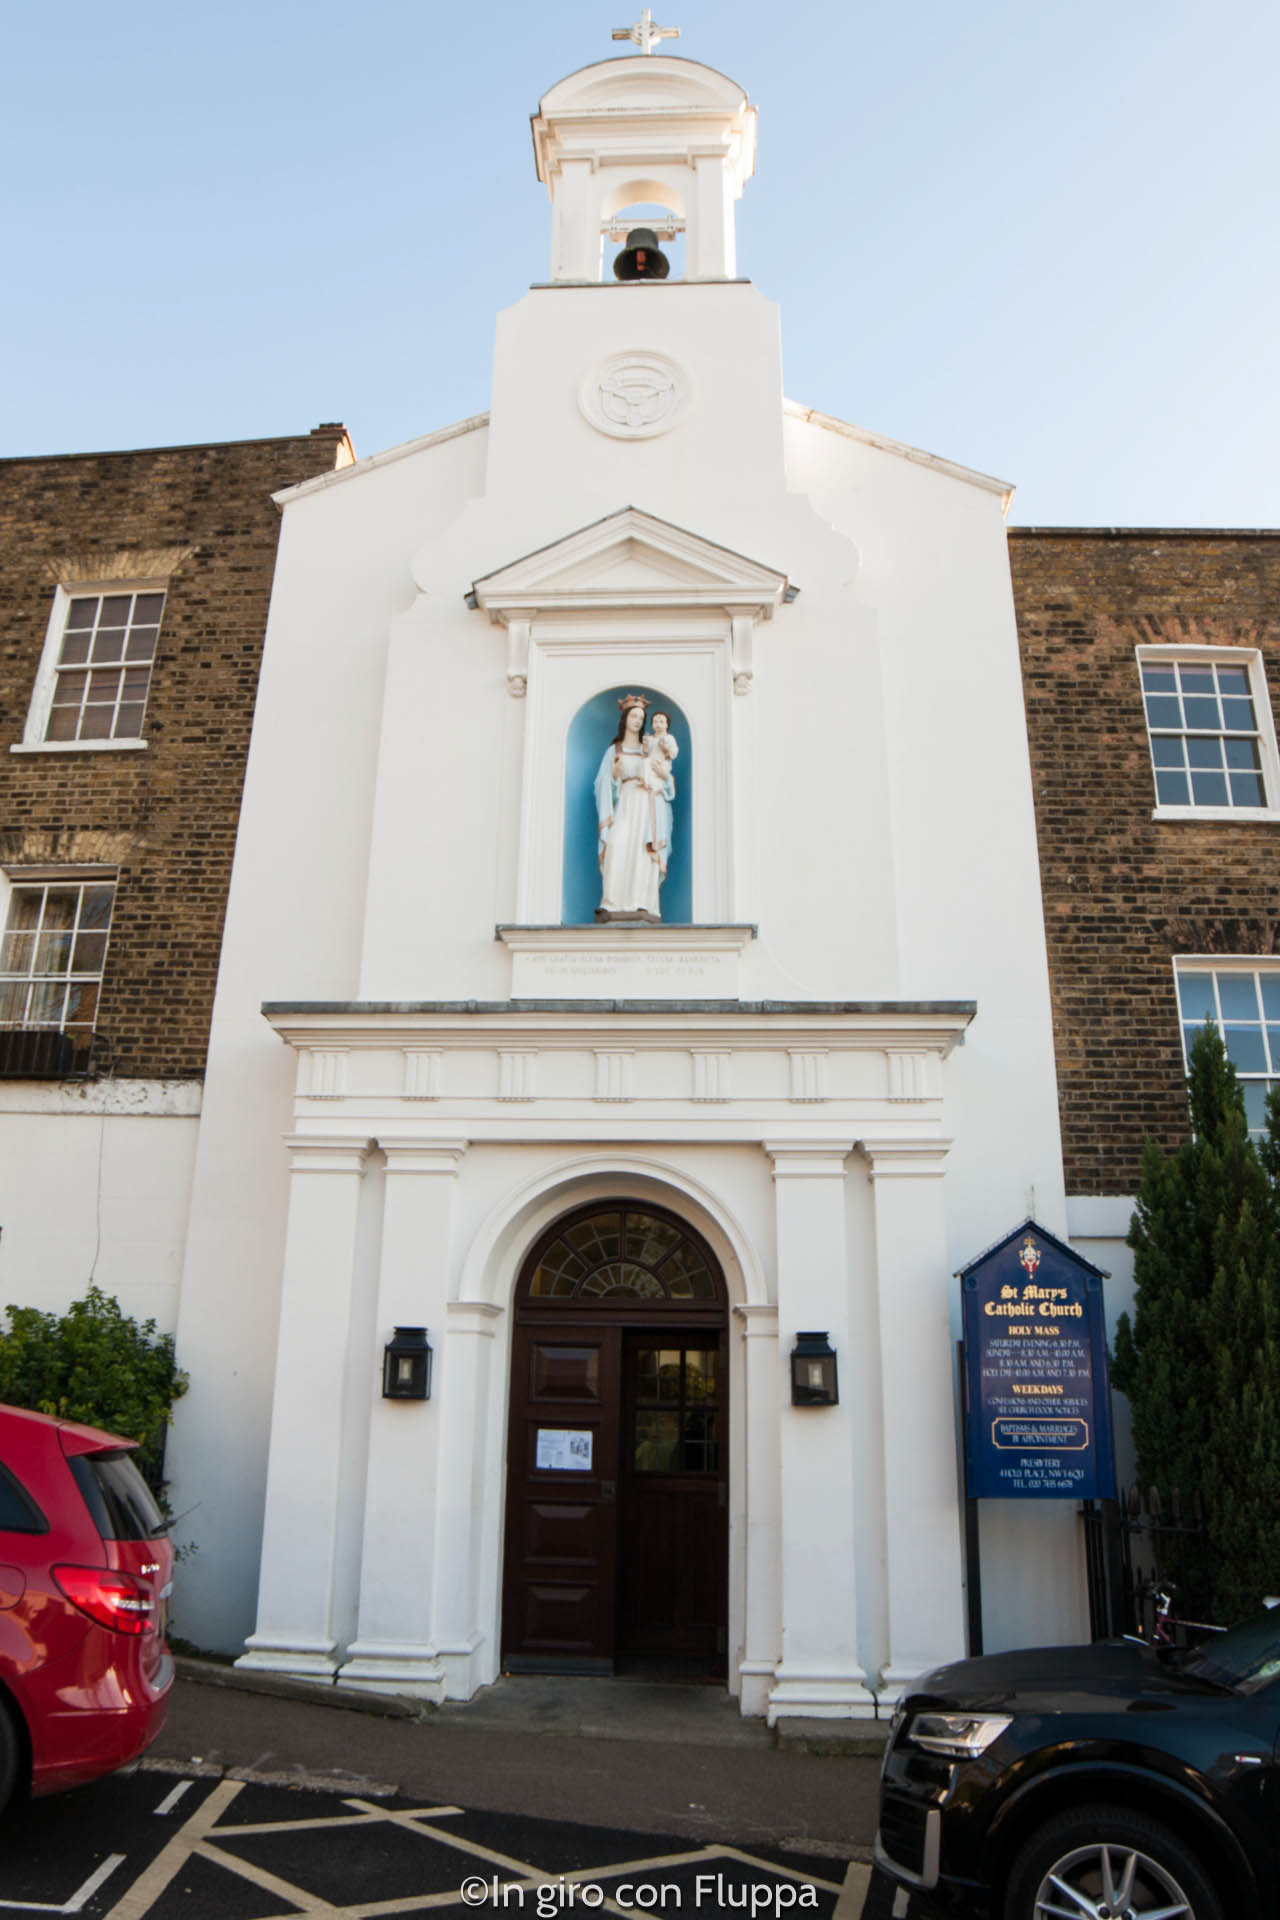 Angoli nascosti di Londra: Hampstead, Holly Walk